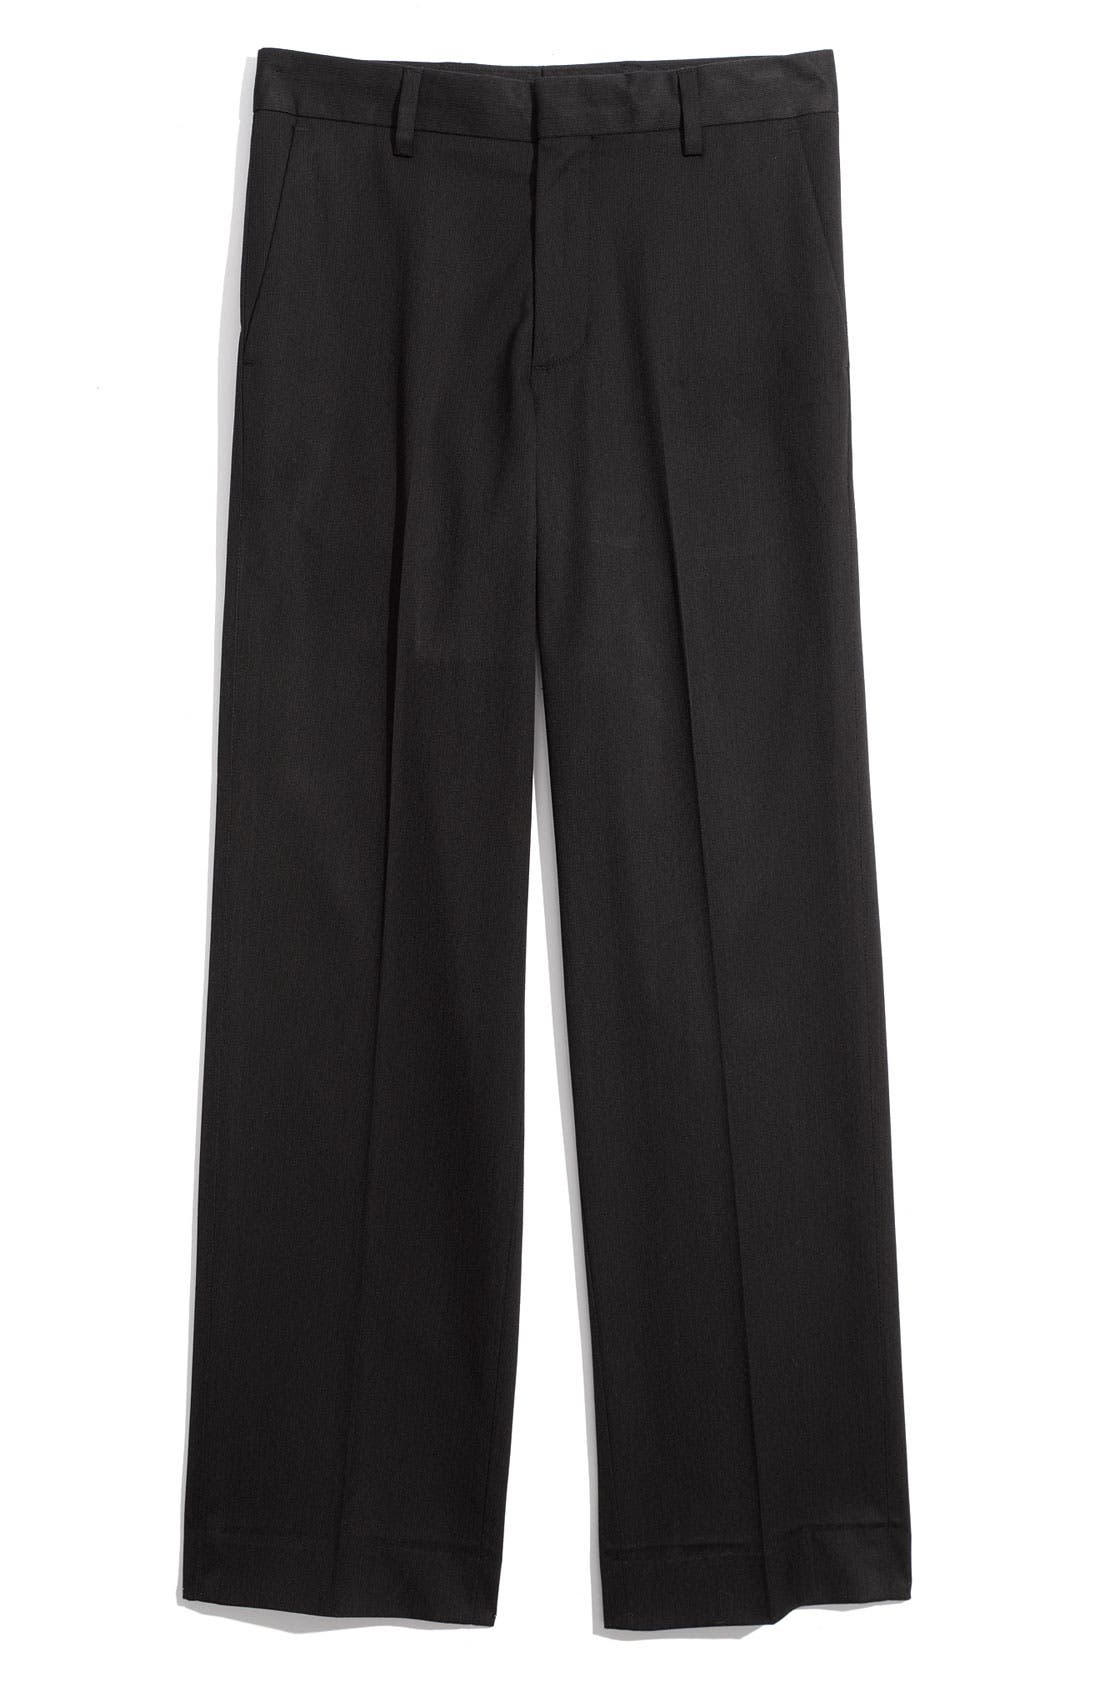 Main Image - C2 by Calibrate Flat Front Slim Pants (Big Boys)